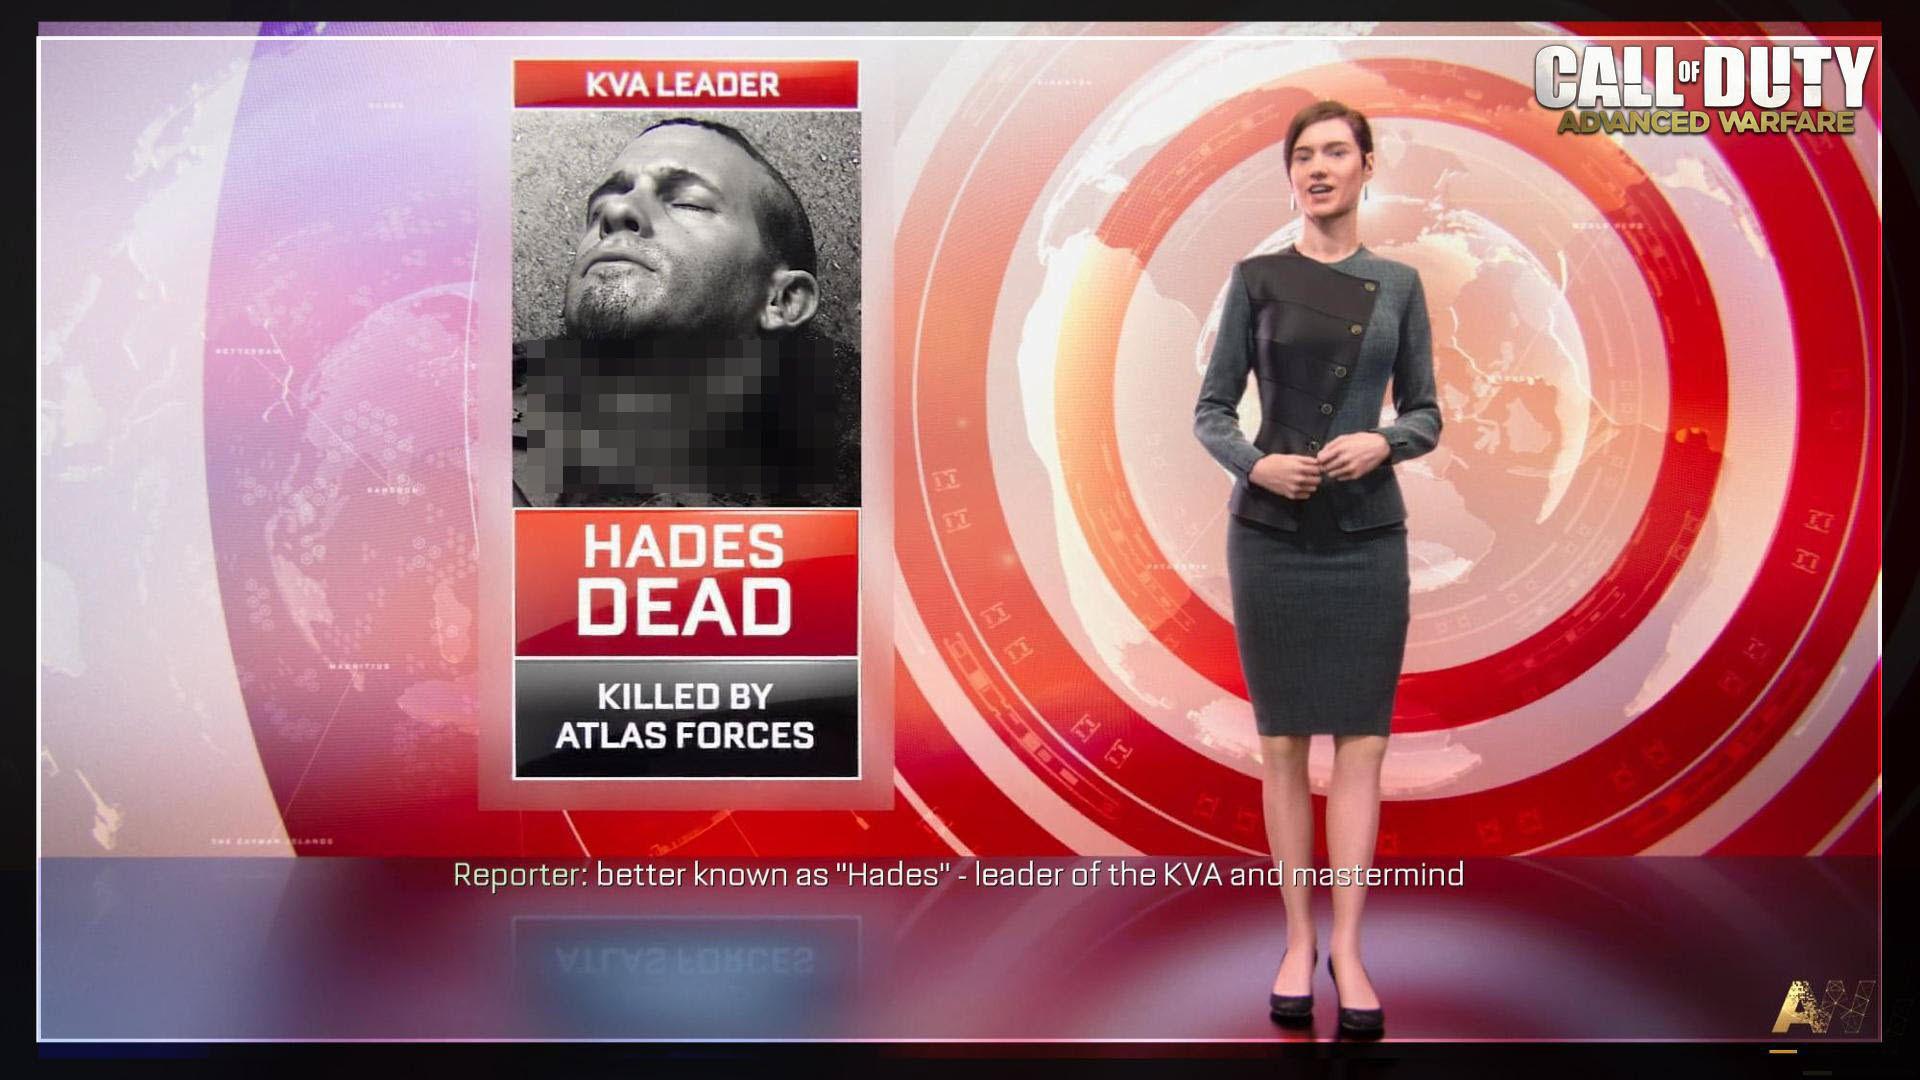 Call of Duty Advanced Warfare Utopia Mission Haberler